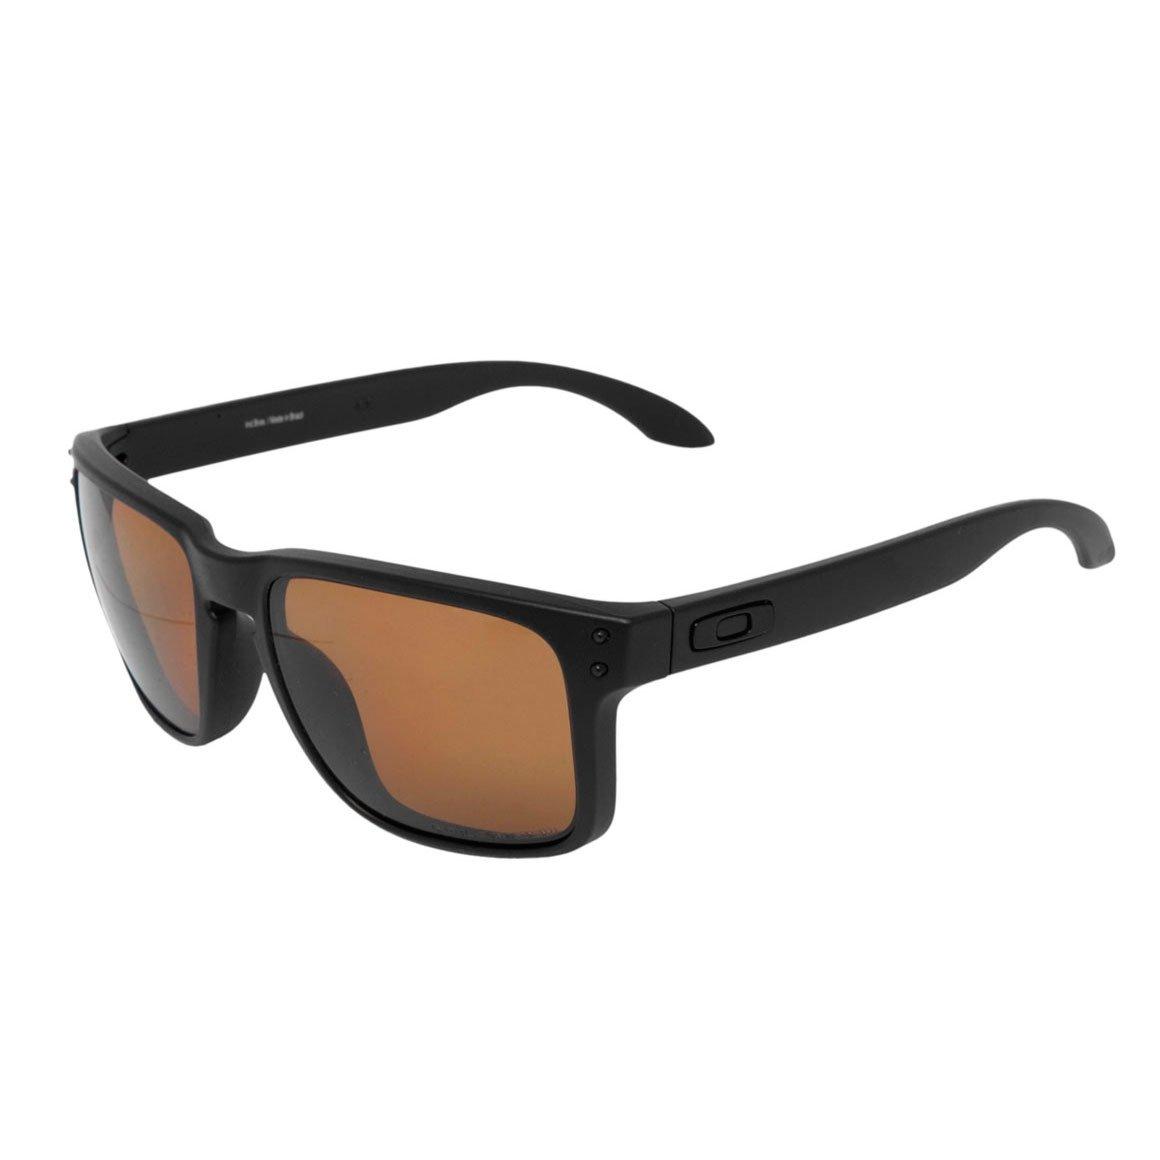 f24c8ad2eee21 Óculos Oakley HOLBROOK MATTE BLACK   BRONZE Polarized - Compre Agora ...